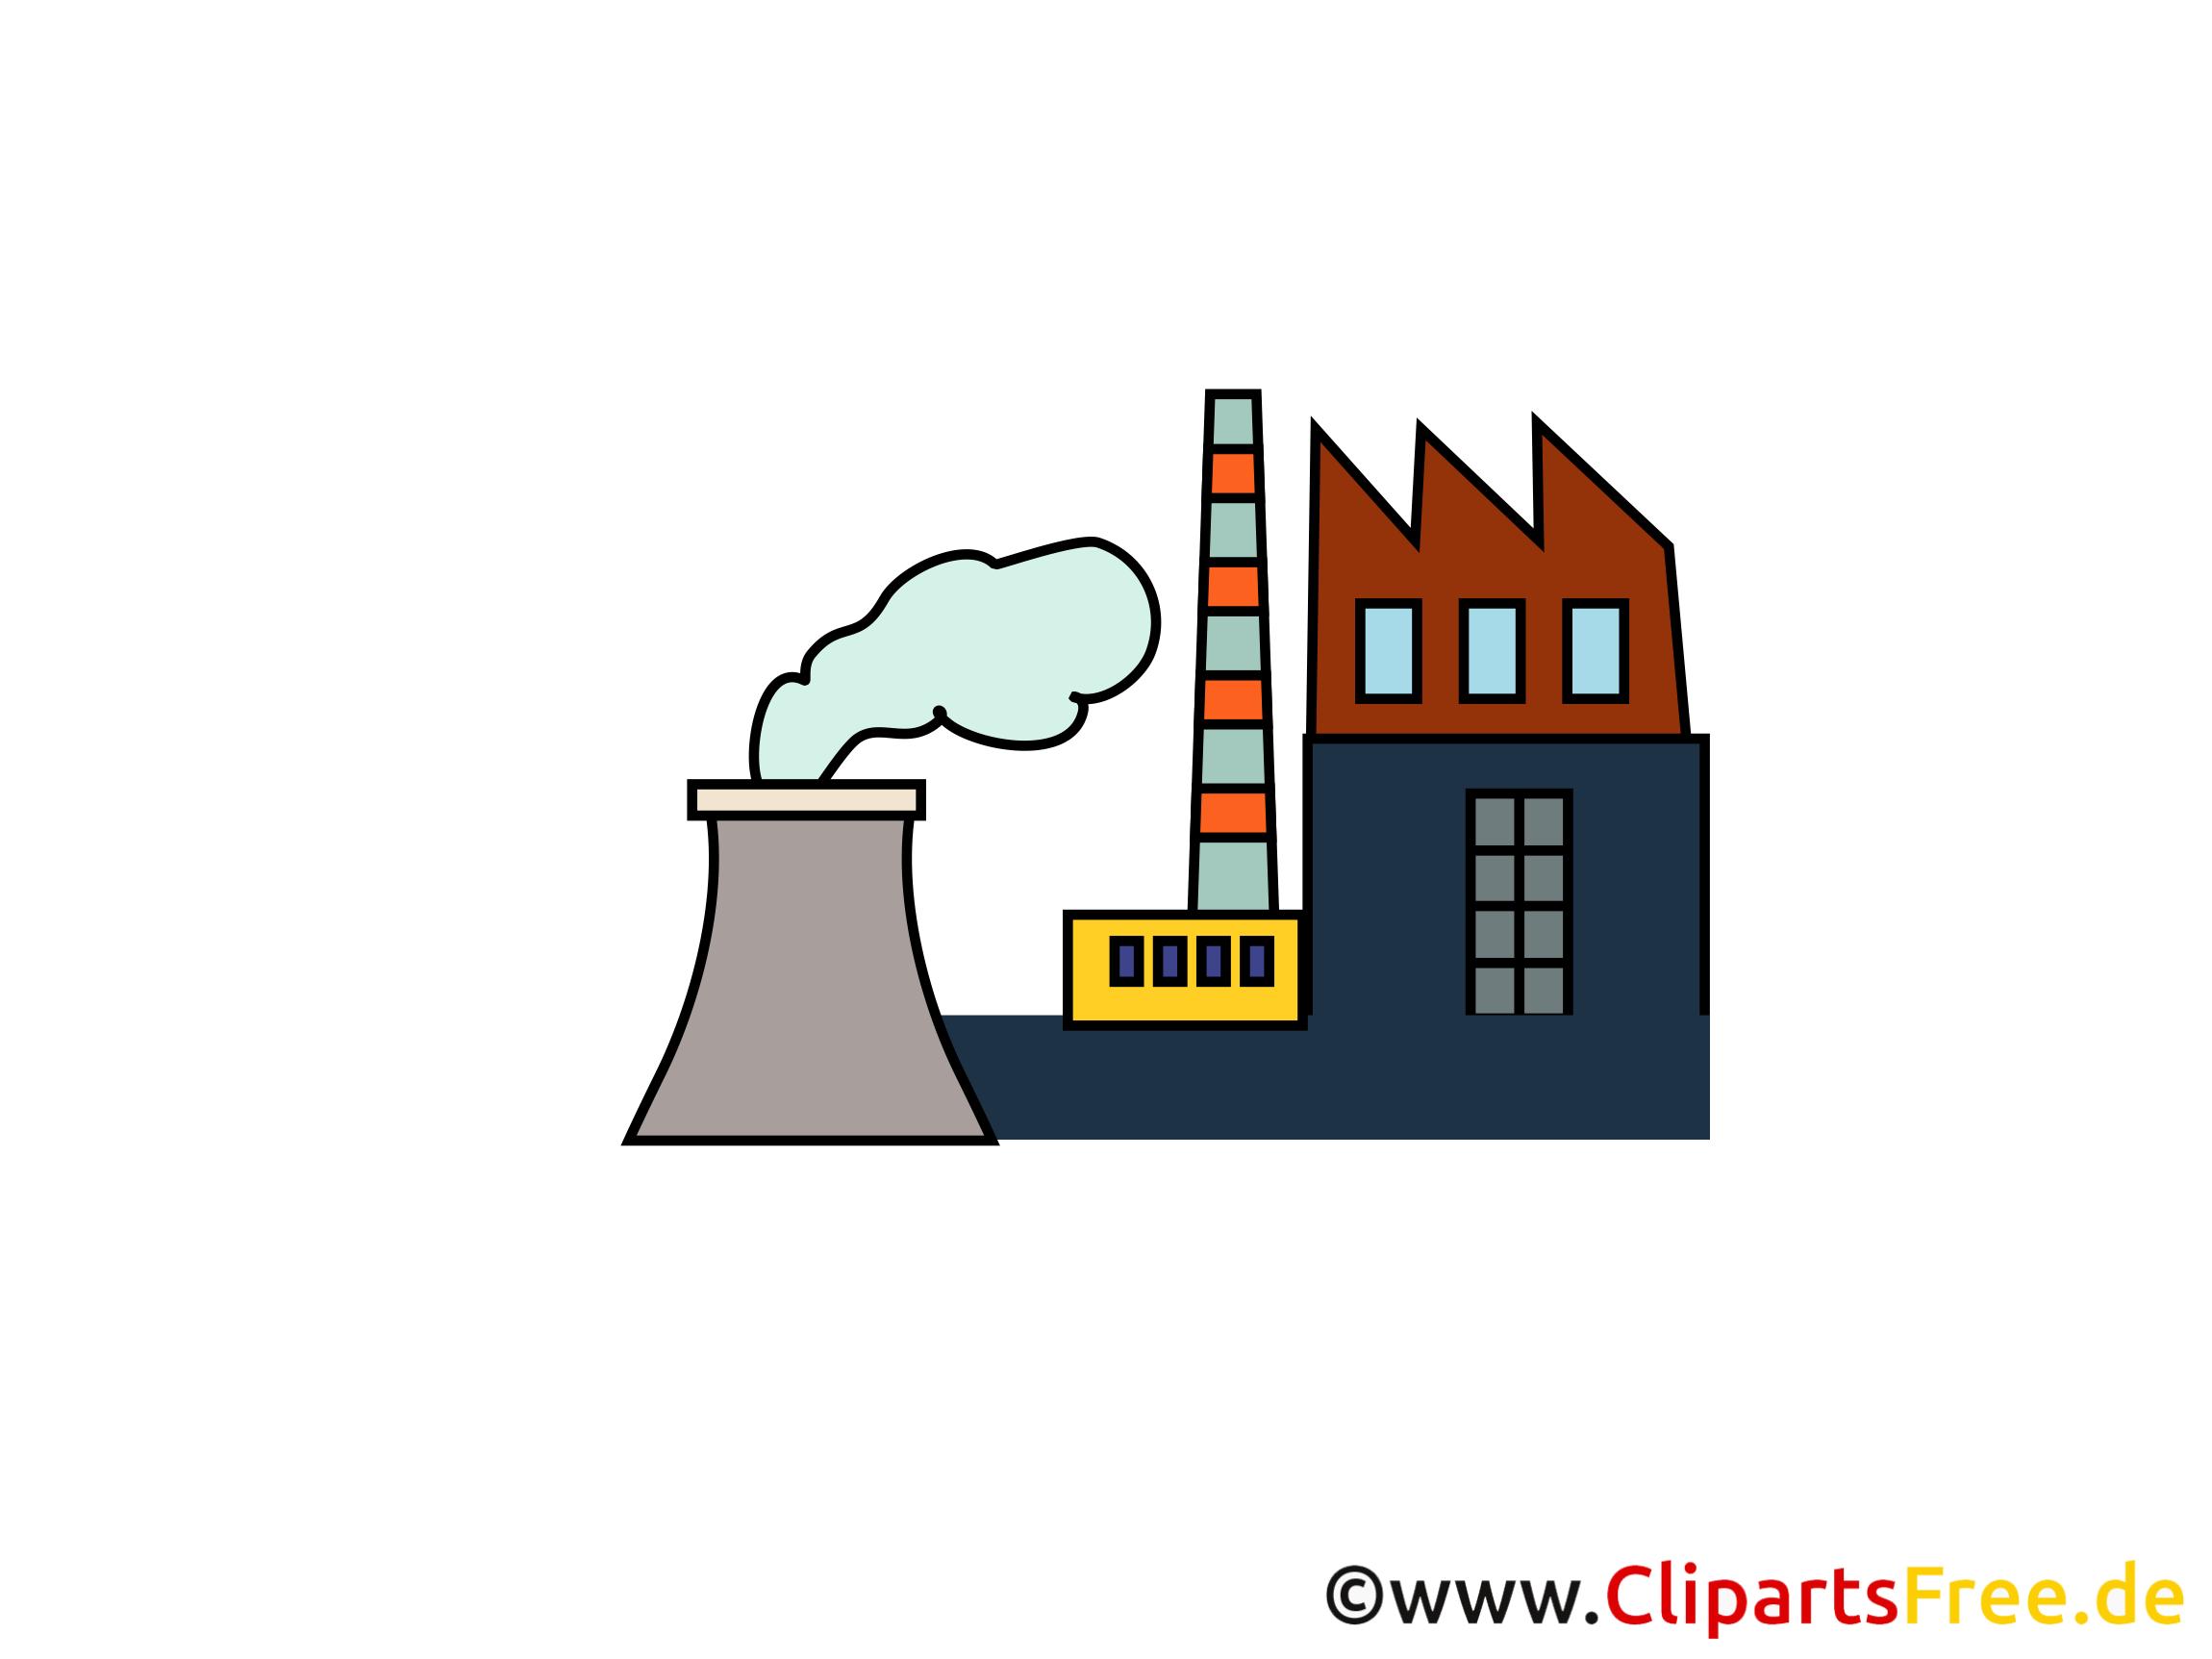 Autowerk Clipart, Bild, Cartoon, Grafik gratis